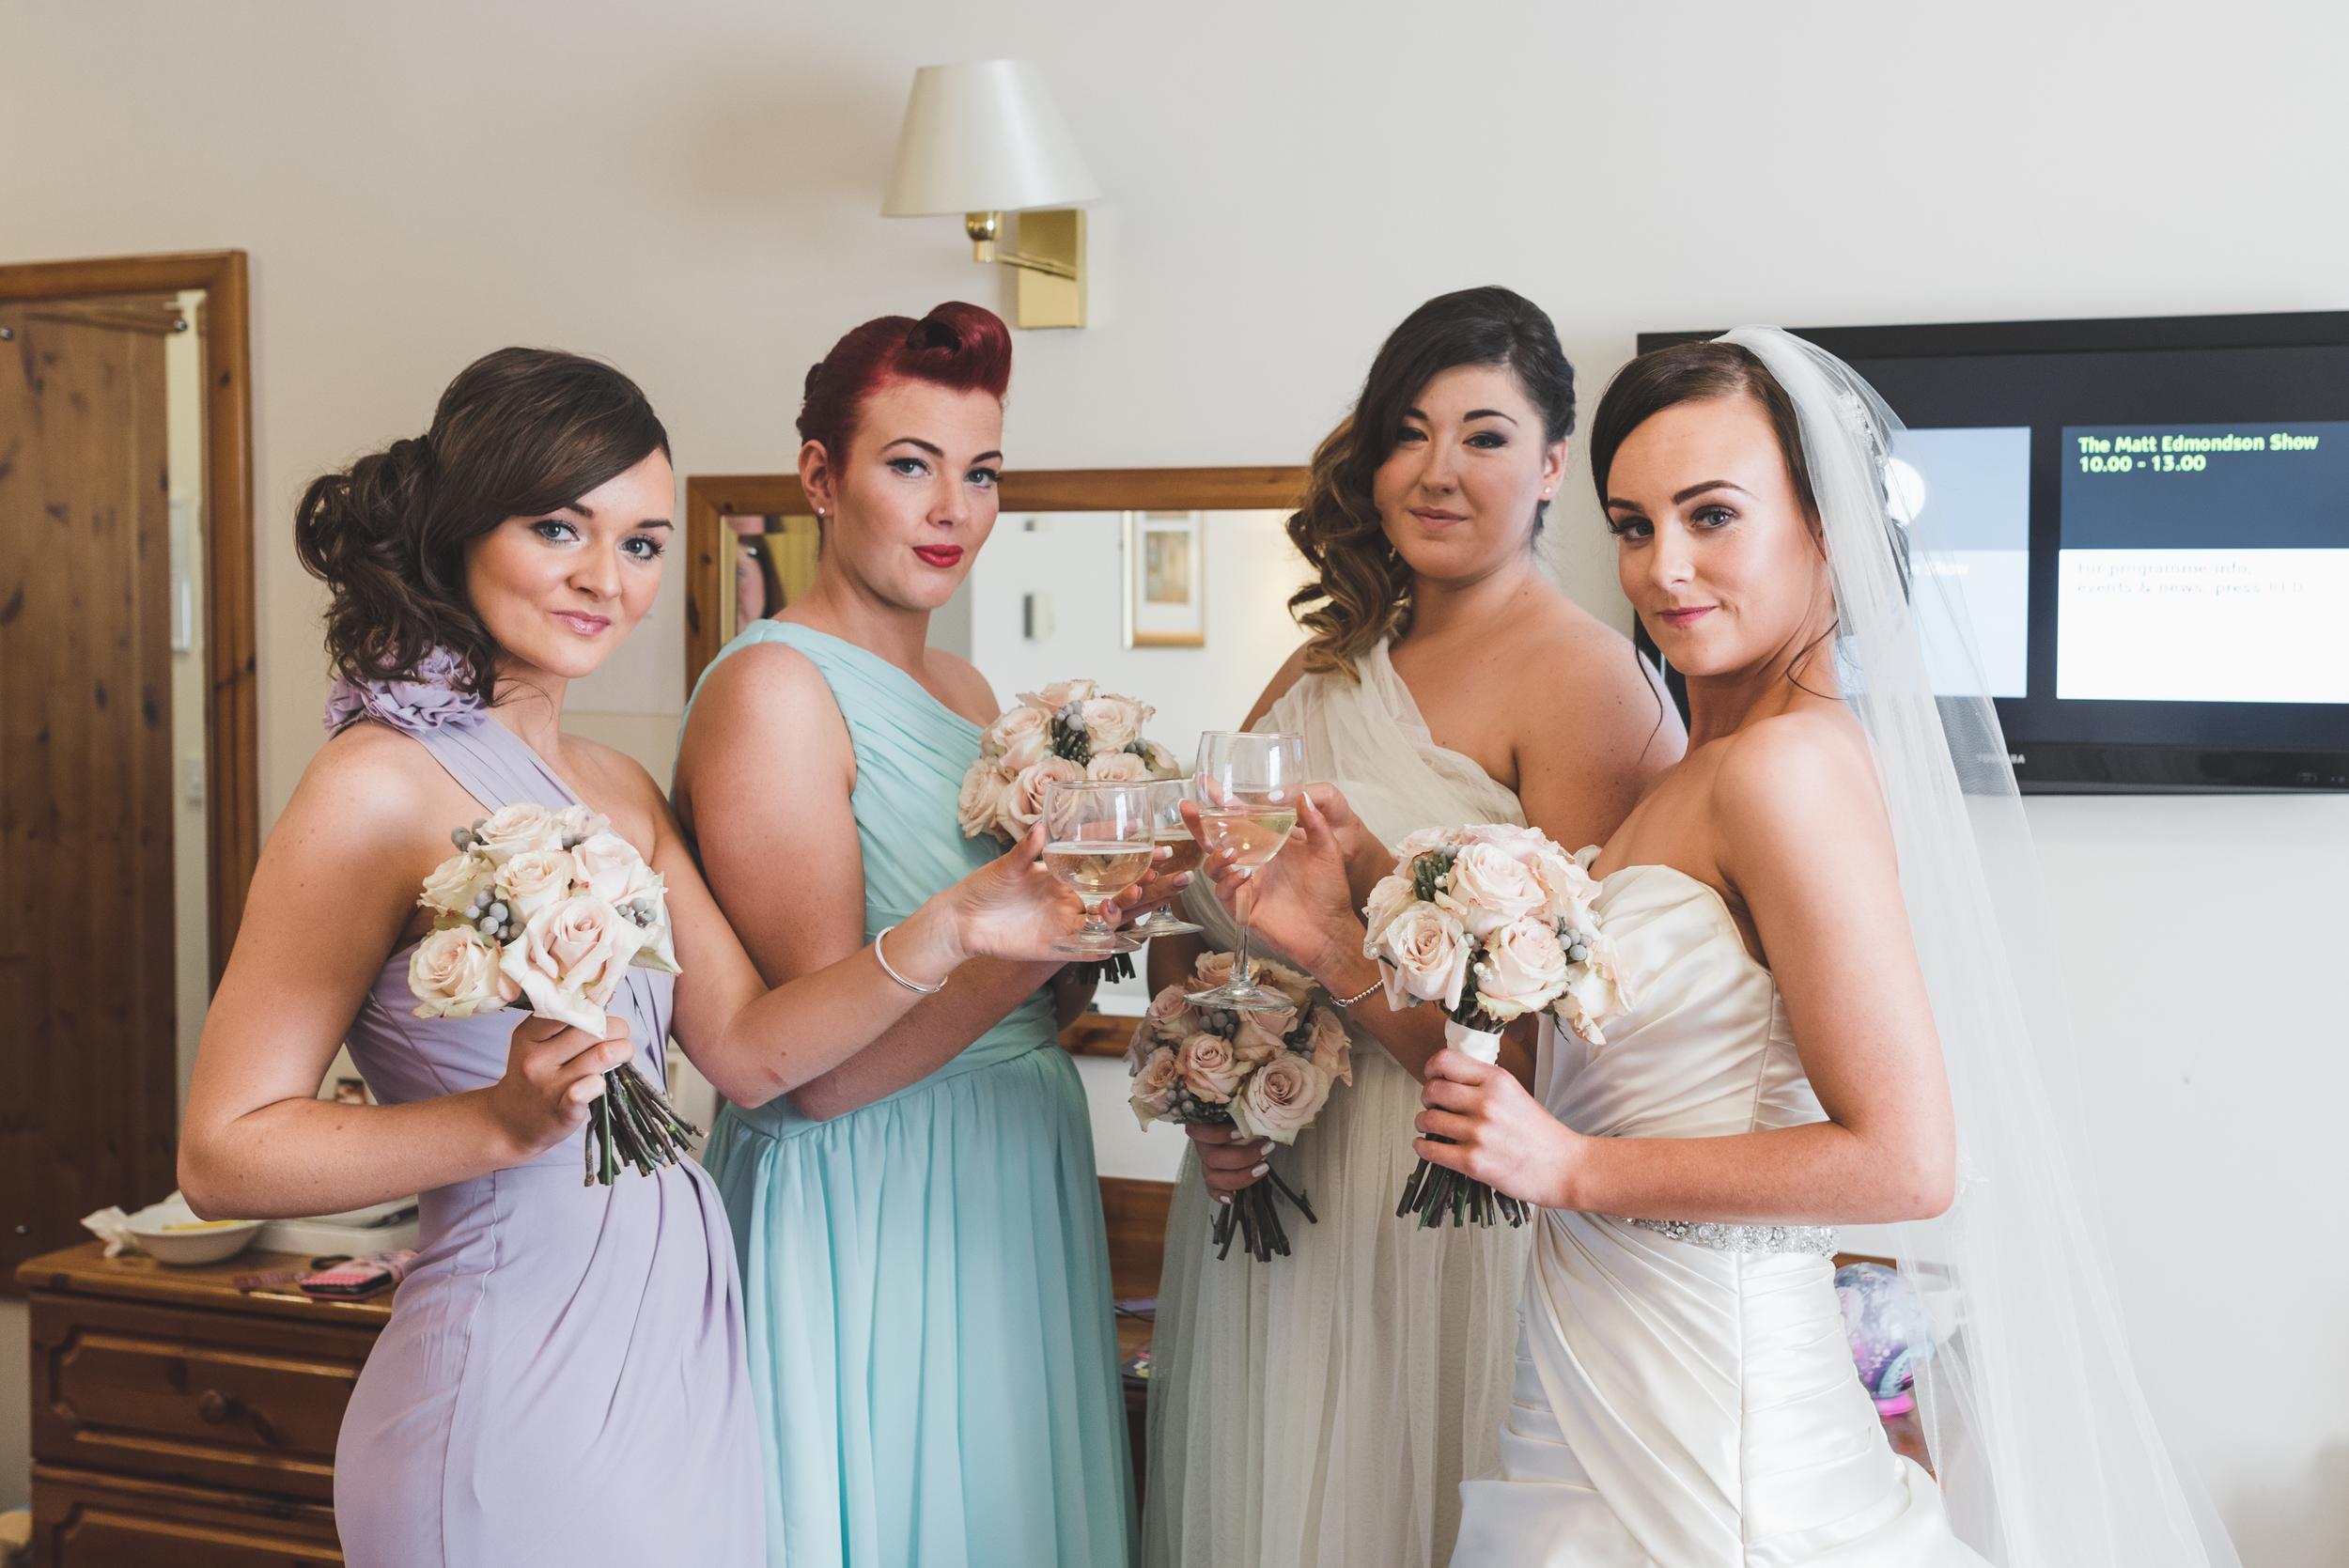 Northern_Ireland_Wedding_Photographer_Purephotoni_Dunsilly_Hotel_Bride_Toast